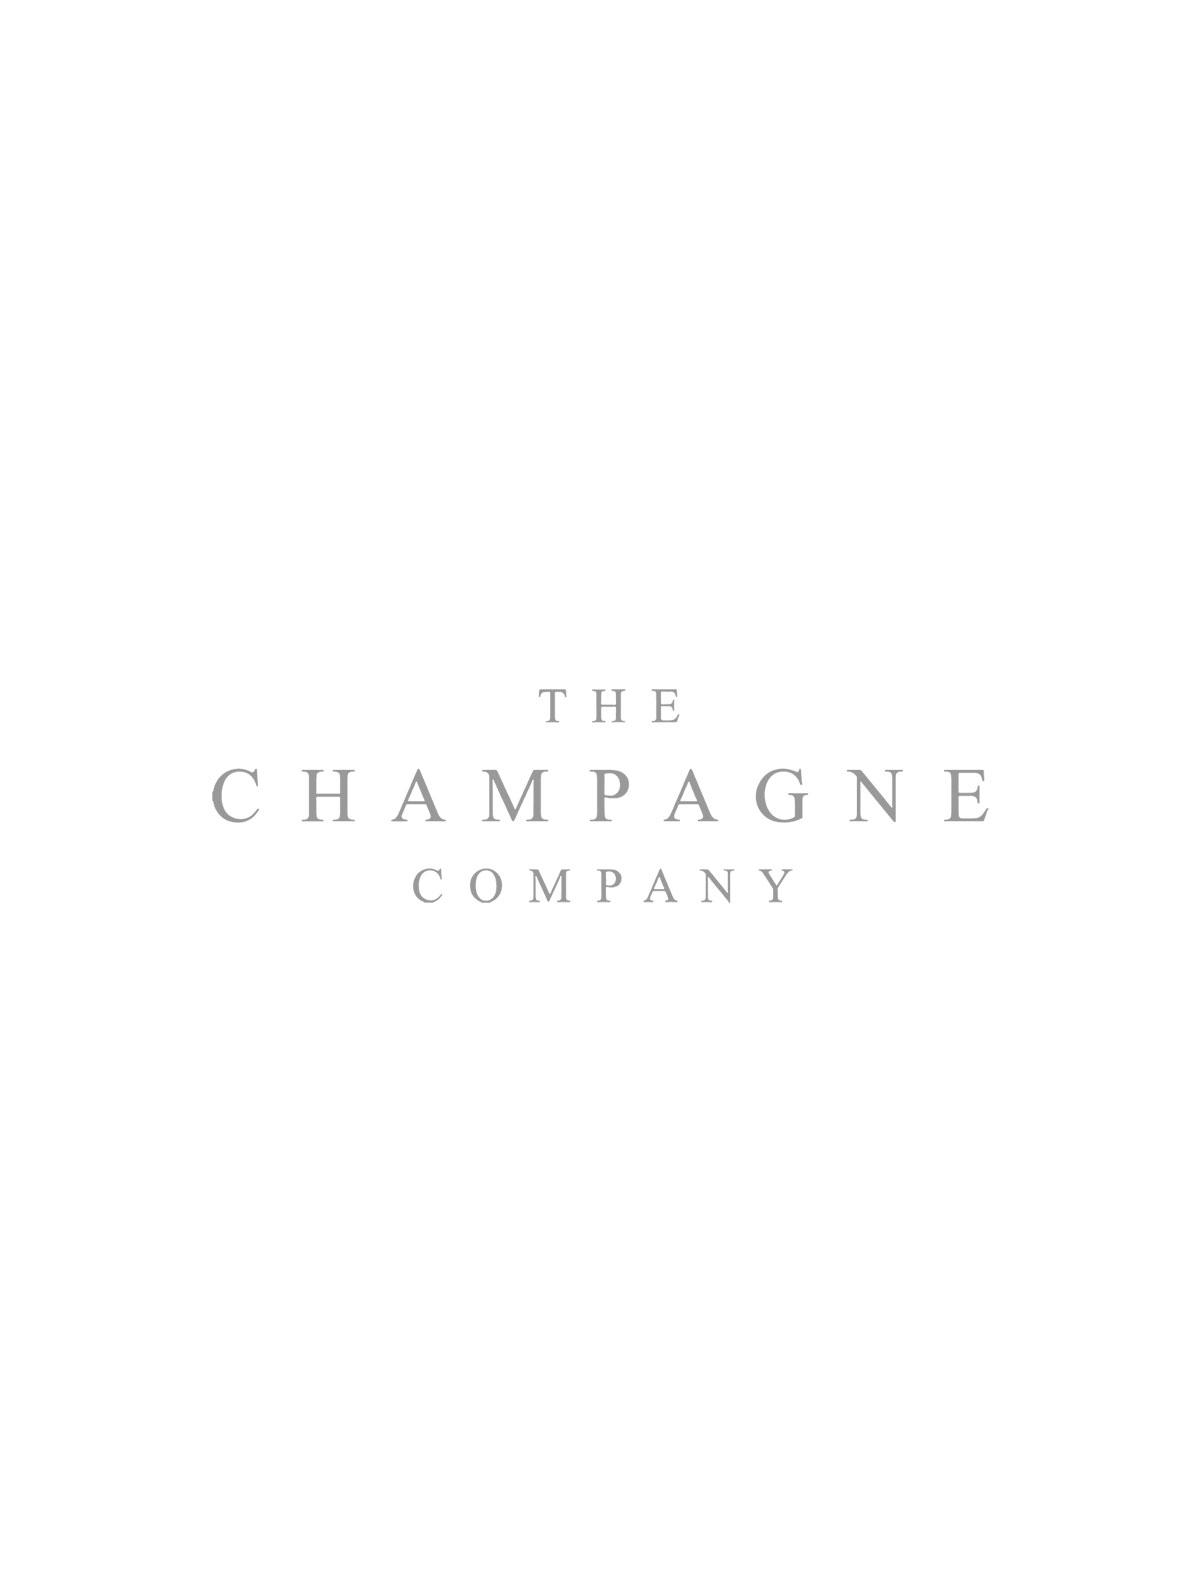 Ardbeg Corryvreckan Islay Single Malt Scotch Whisky 70cl Gift Box